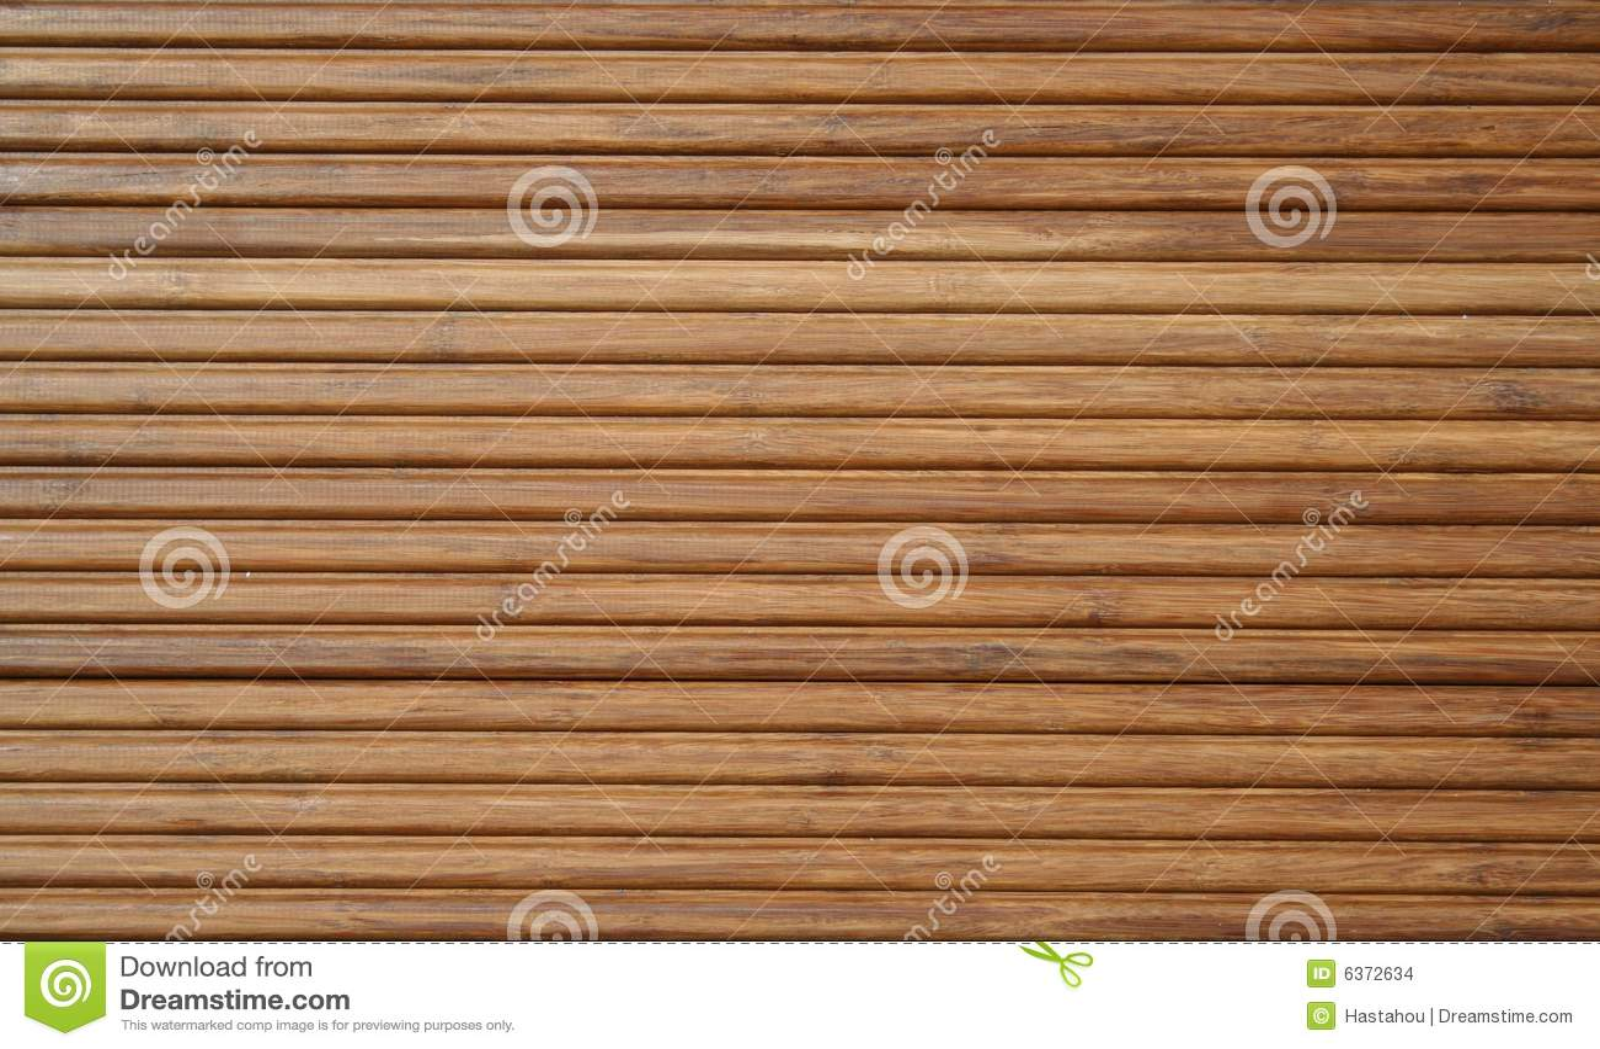 Bamboo decking stock photo  Image of bamboo, terrasse - 6372634